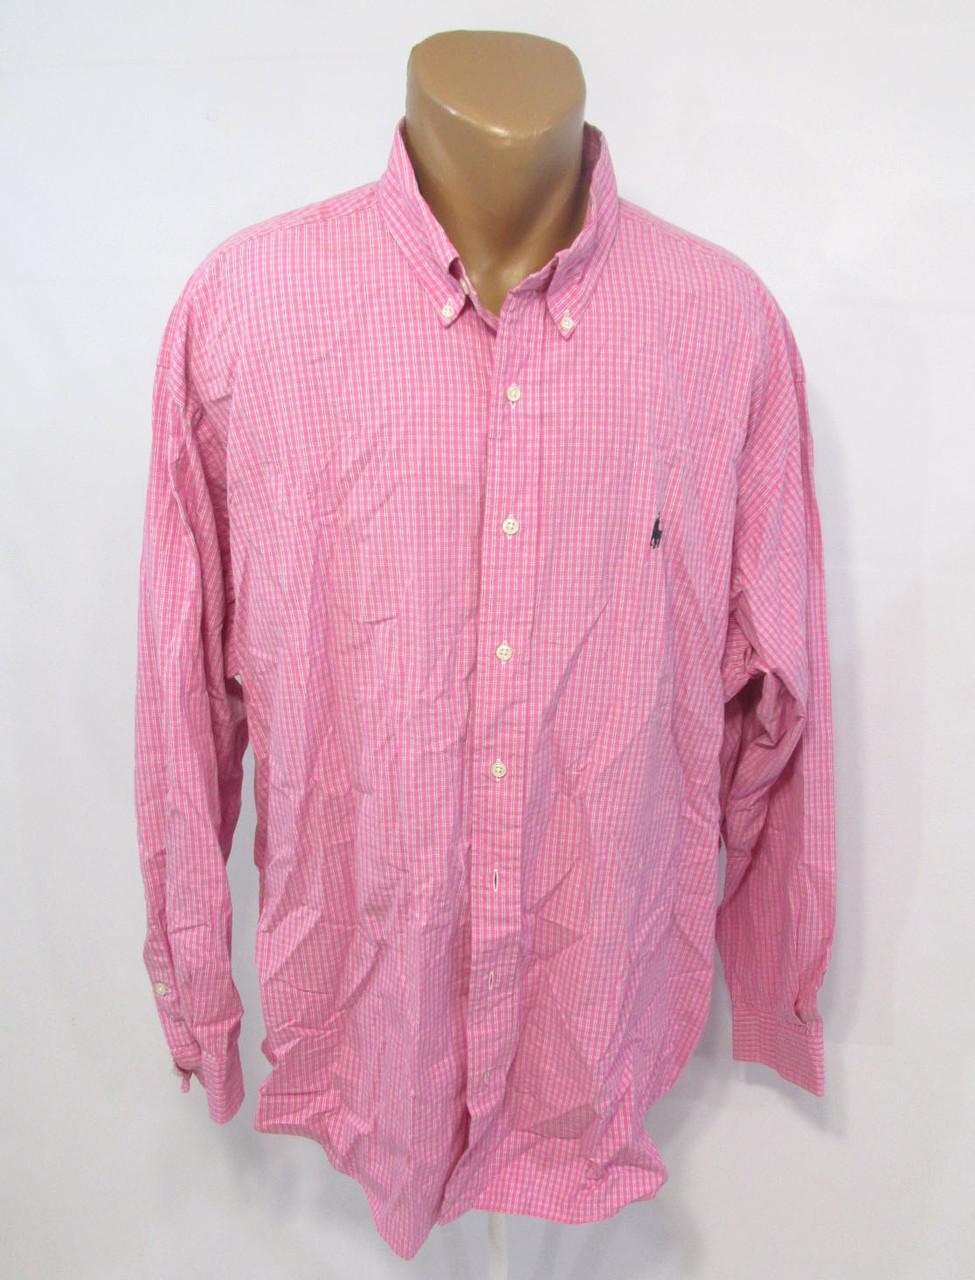 Купить рубашку мужскую в Украине ᐉ Продажа мужских рубашек 757311adbab79